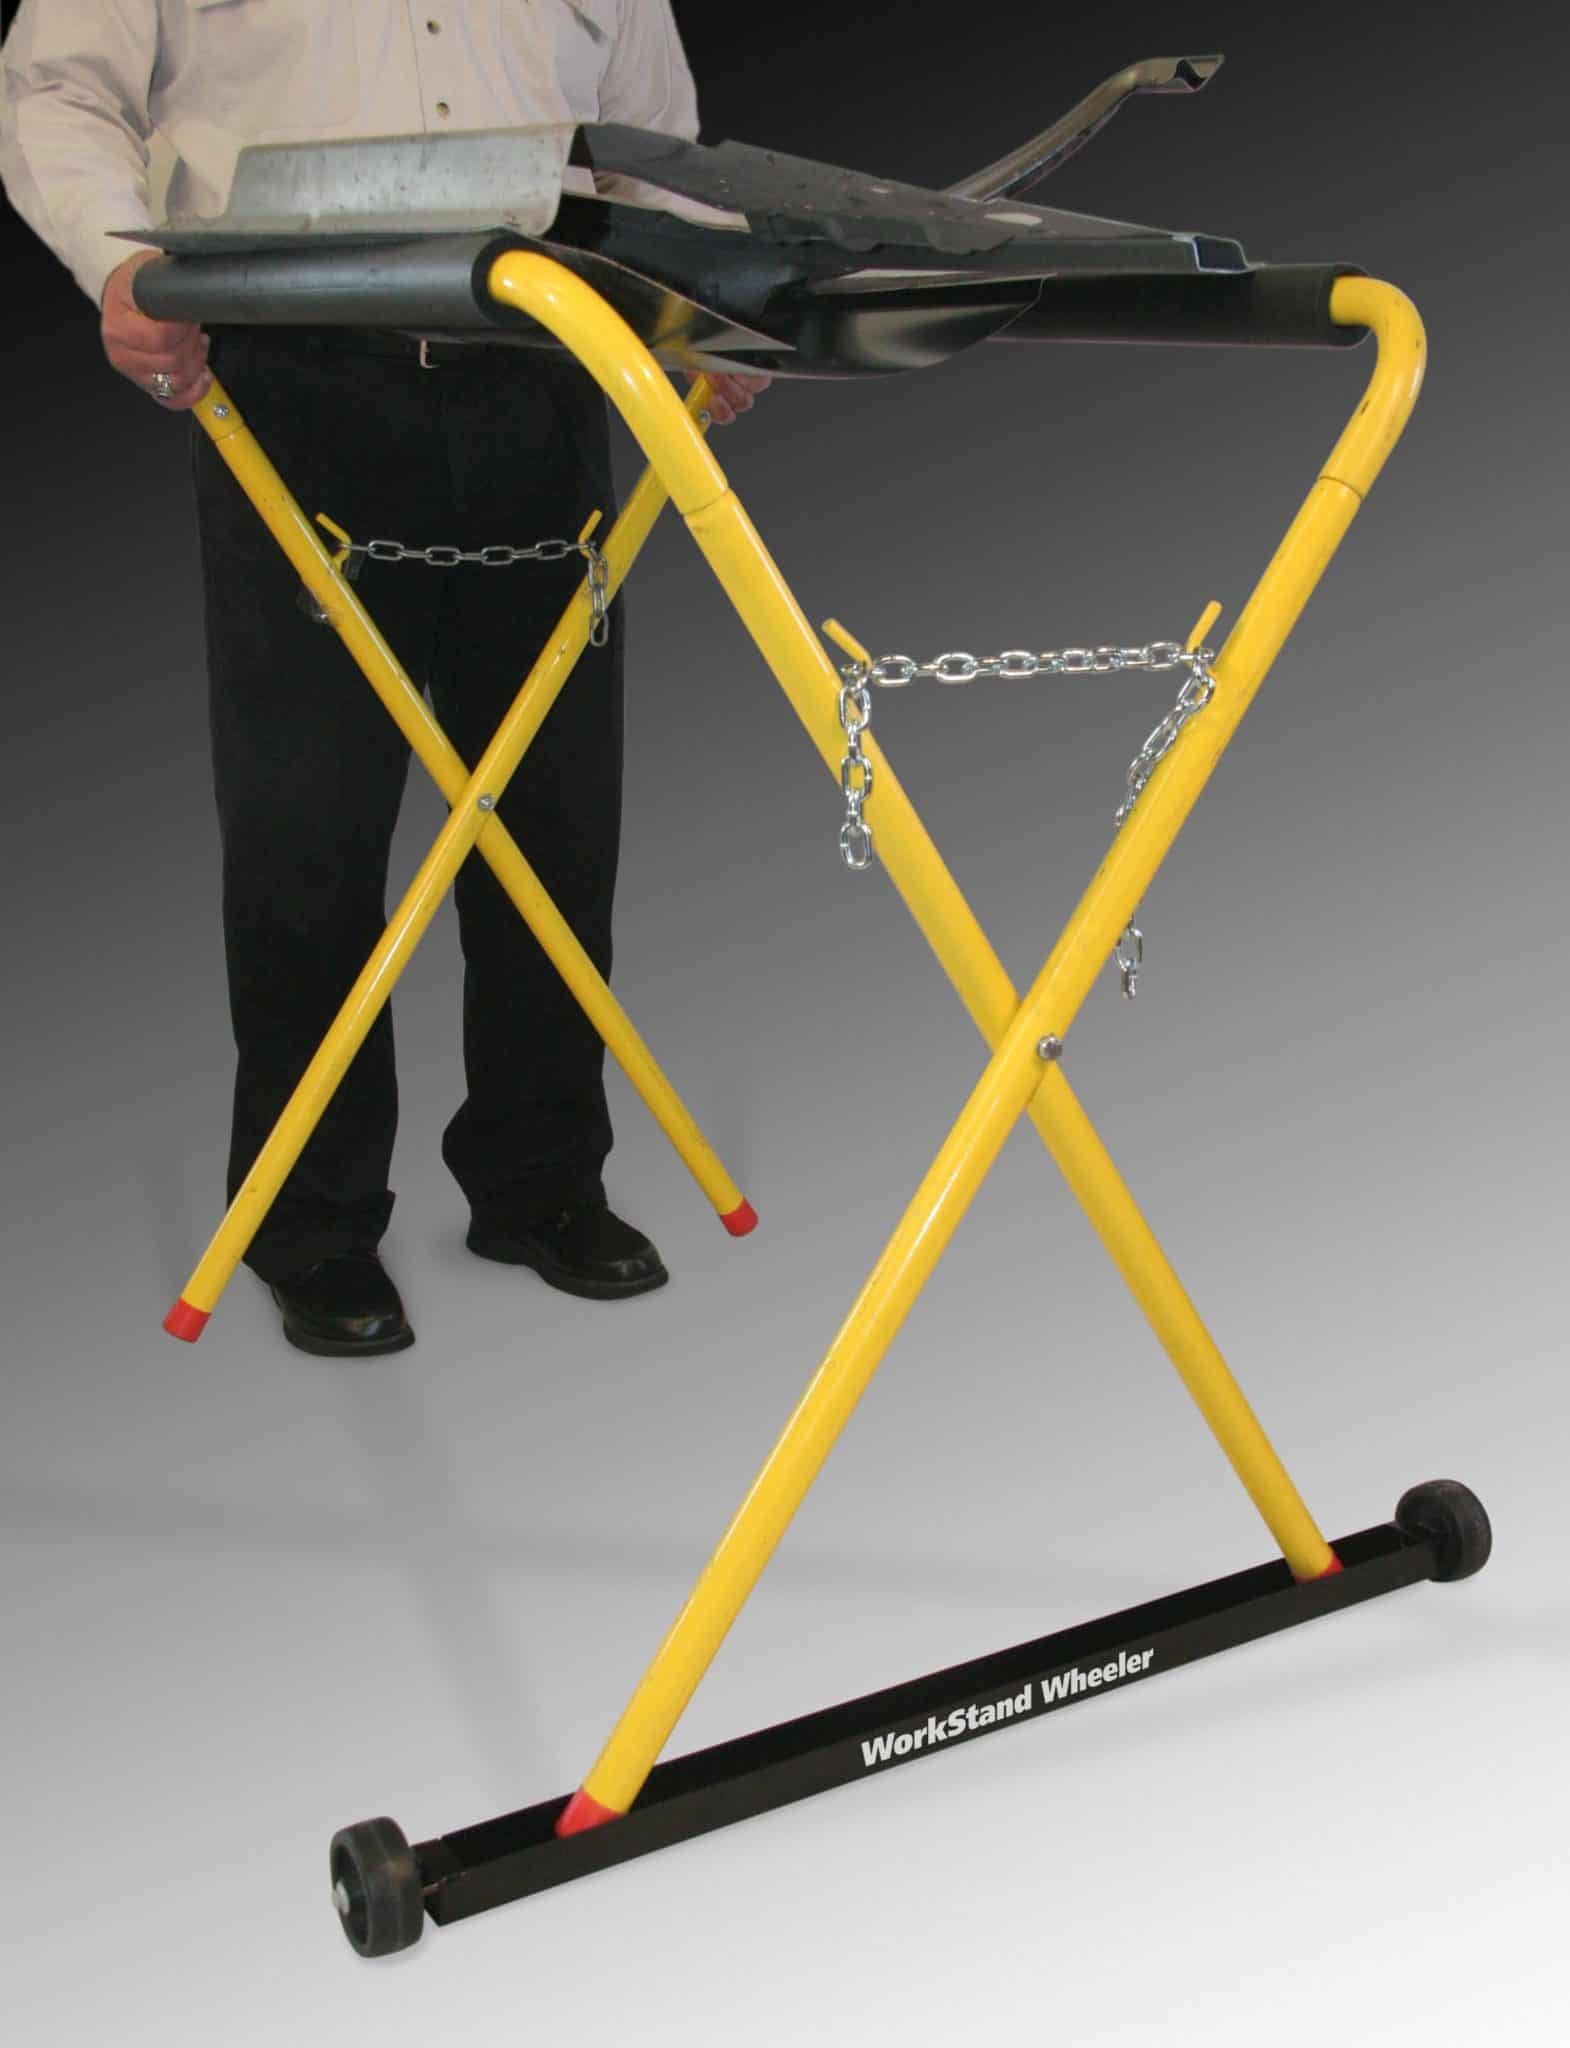 Steck Manufacturing 35756 Work Stand Wheeler